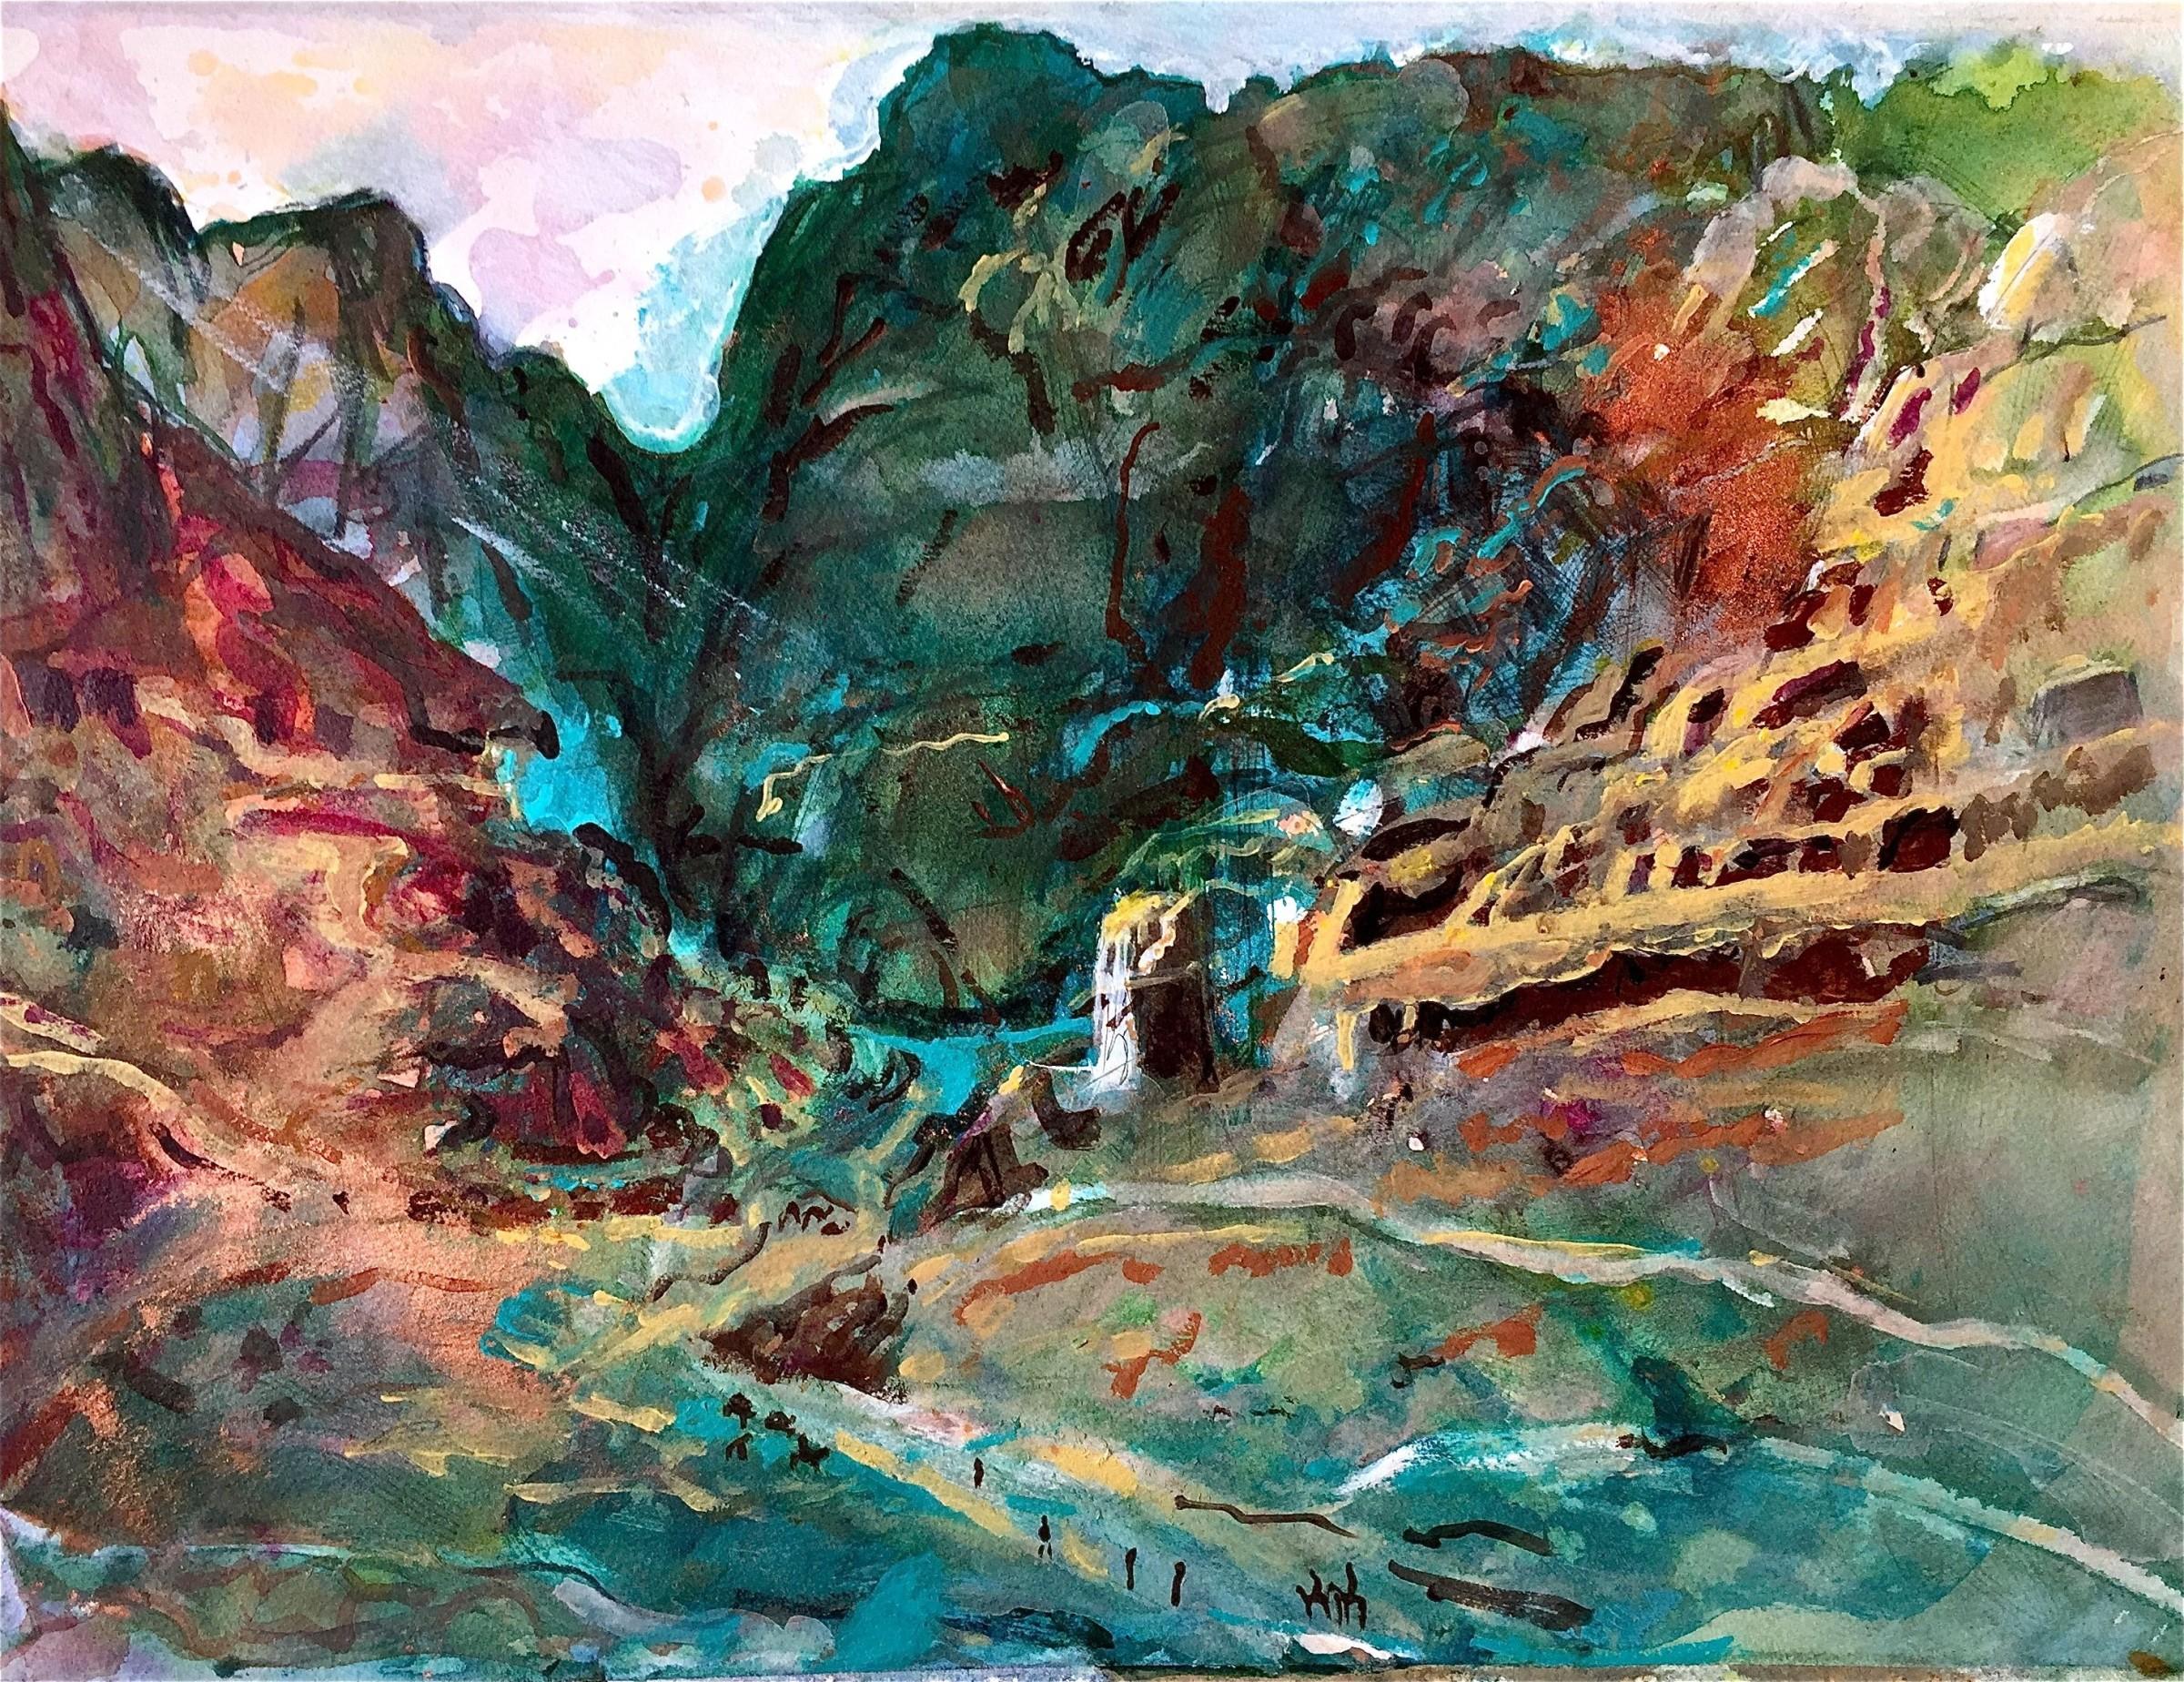 <span class=&#34;link fancybox-details-link&#34;><a href=&#34;/exhibitions/16/works/image_standalone386/&#34;>View Detail Page</a></span><p>Alex Hirztel,&#160;<em>Petra, Looking Across</em>, &#163;400</p>